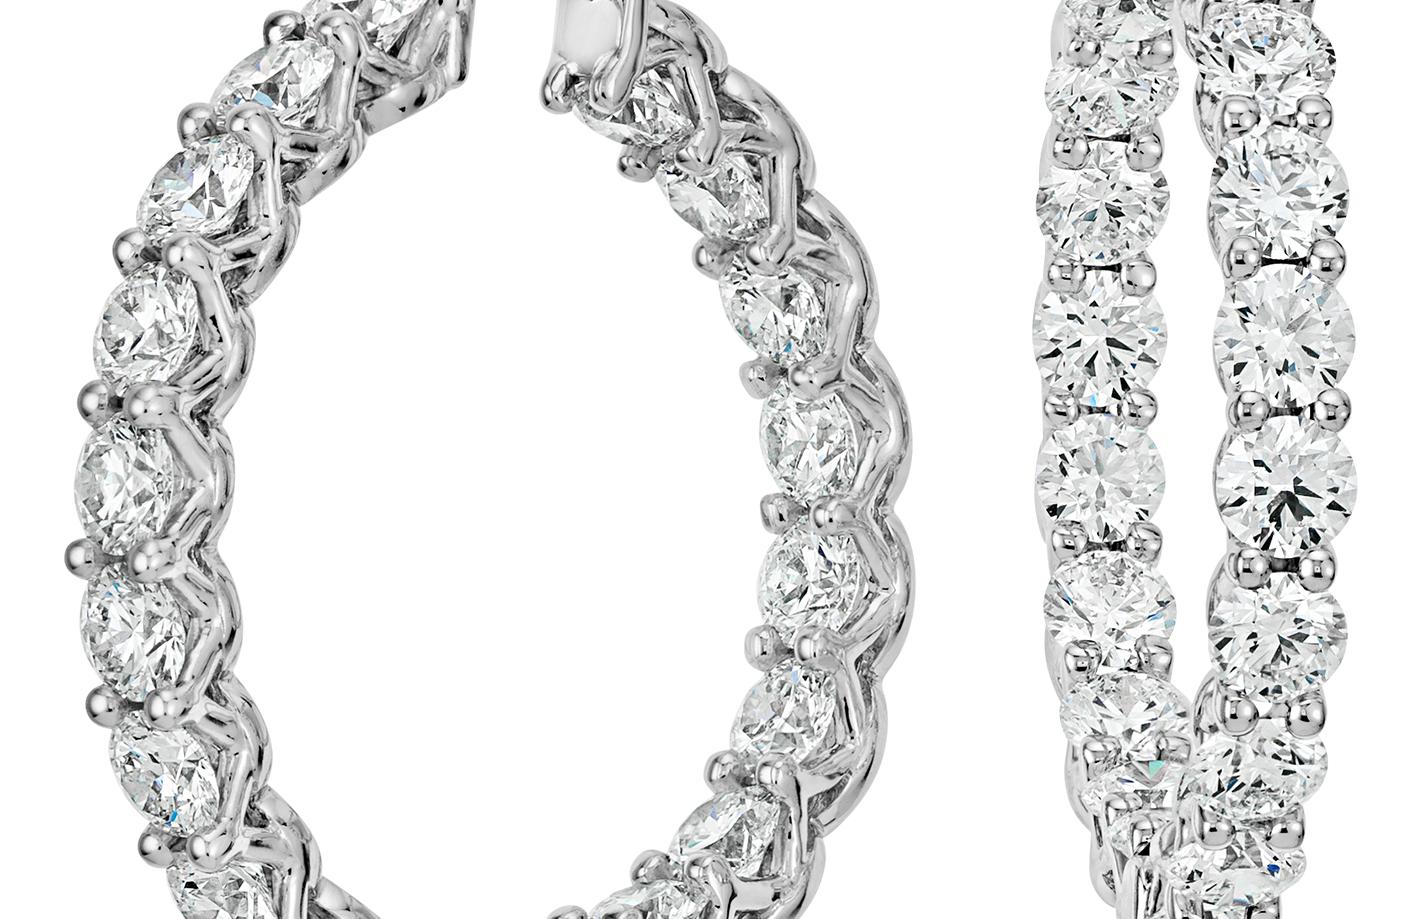 Aretes tipo argolla de eternidad de diamantes exclusivo de Blue Nile en platino (6 qt. total)